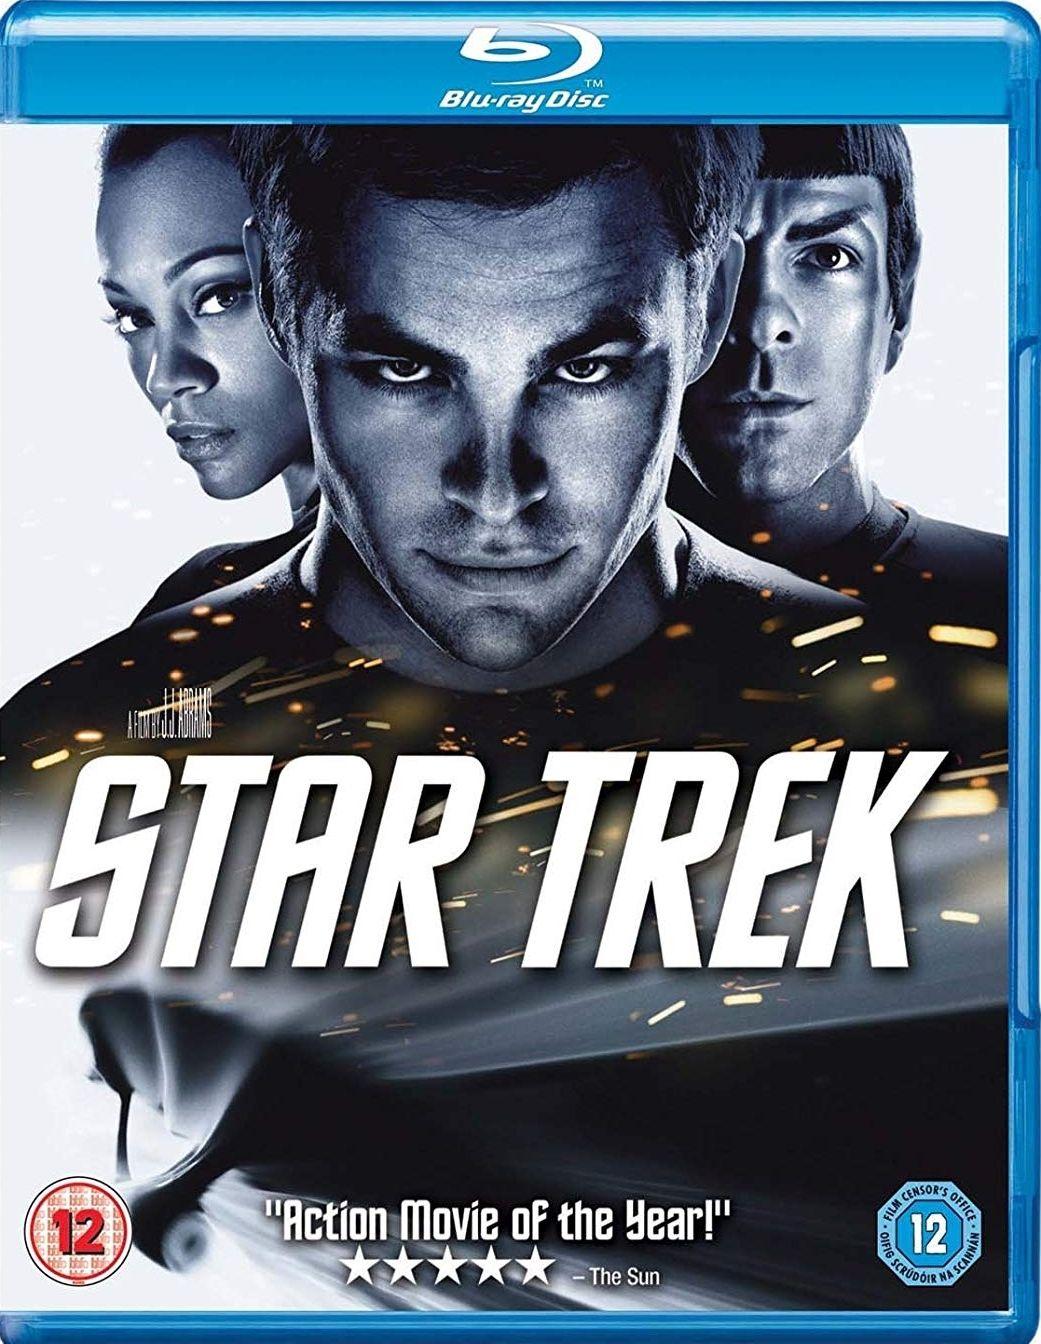 Star Trek [Blu-ray] [2009] [Region Free] @ Amazon £2.49 (Prime) £6.48 (Non Prime)